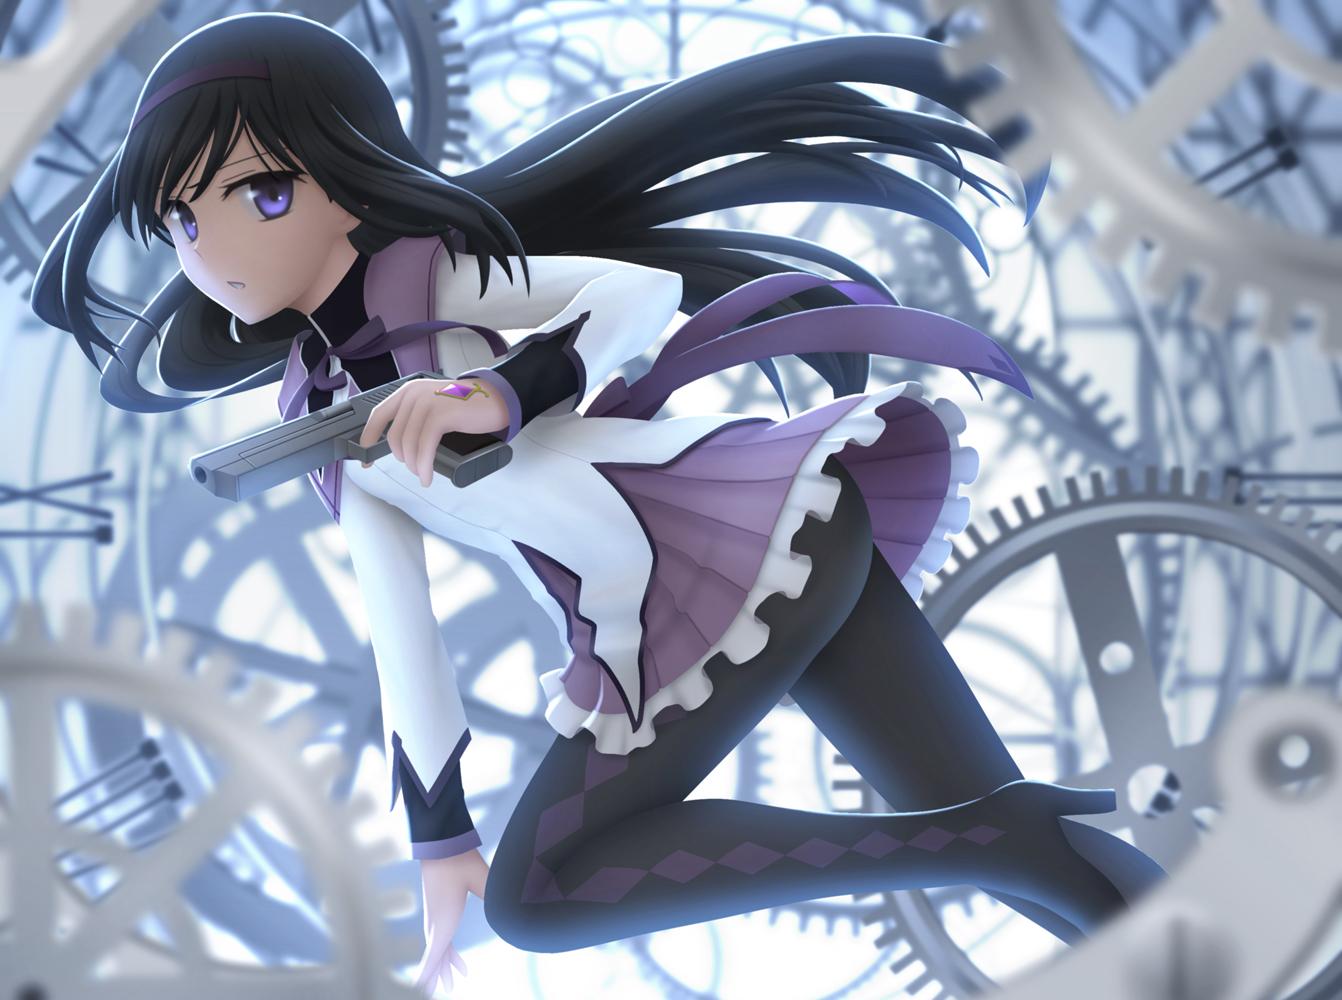 akemi_homura black_hair gun headband long_hair mahou_shoujo_madoka_magica pantyhose purple_eyes seifuku siraha skirt weapon